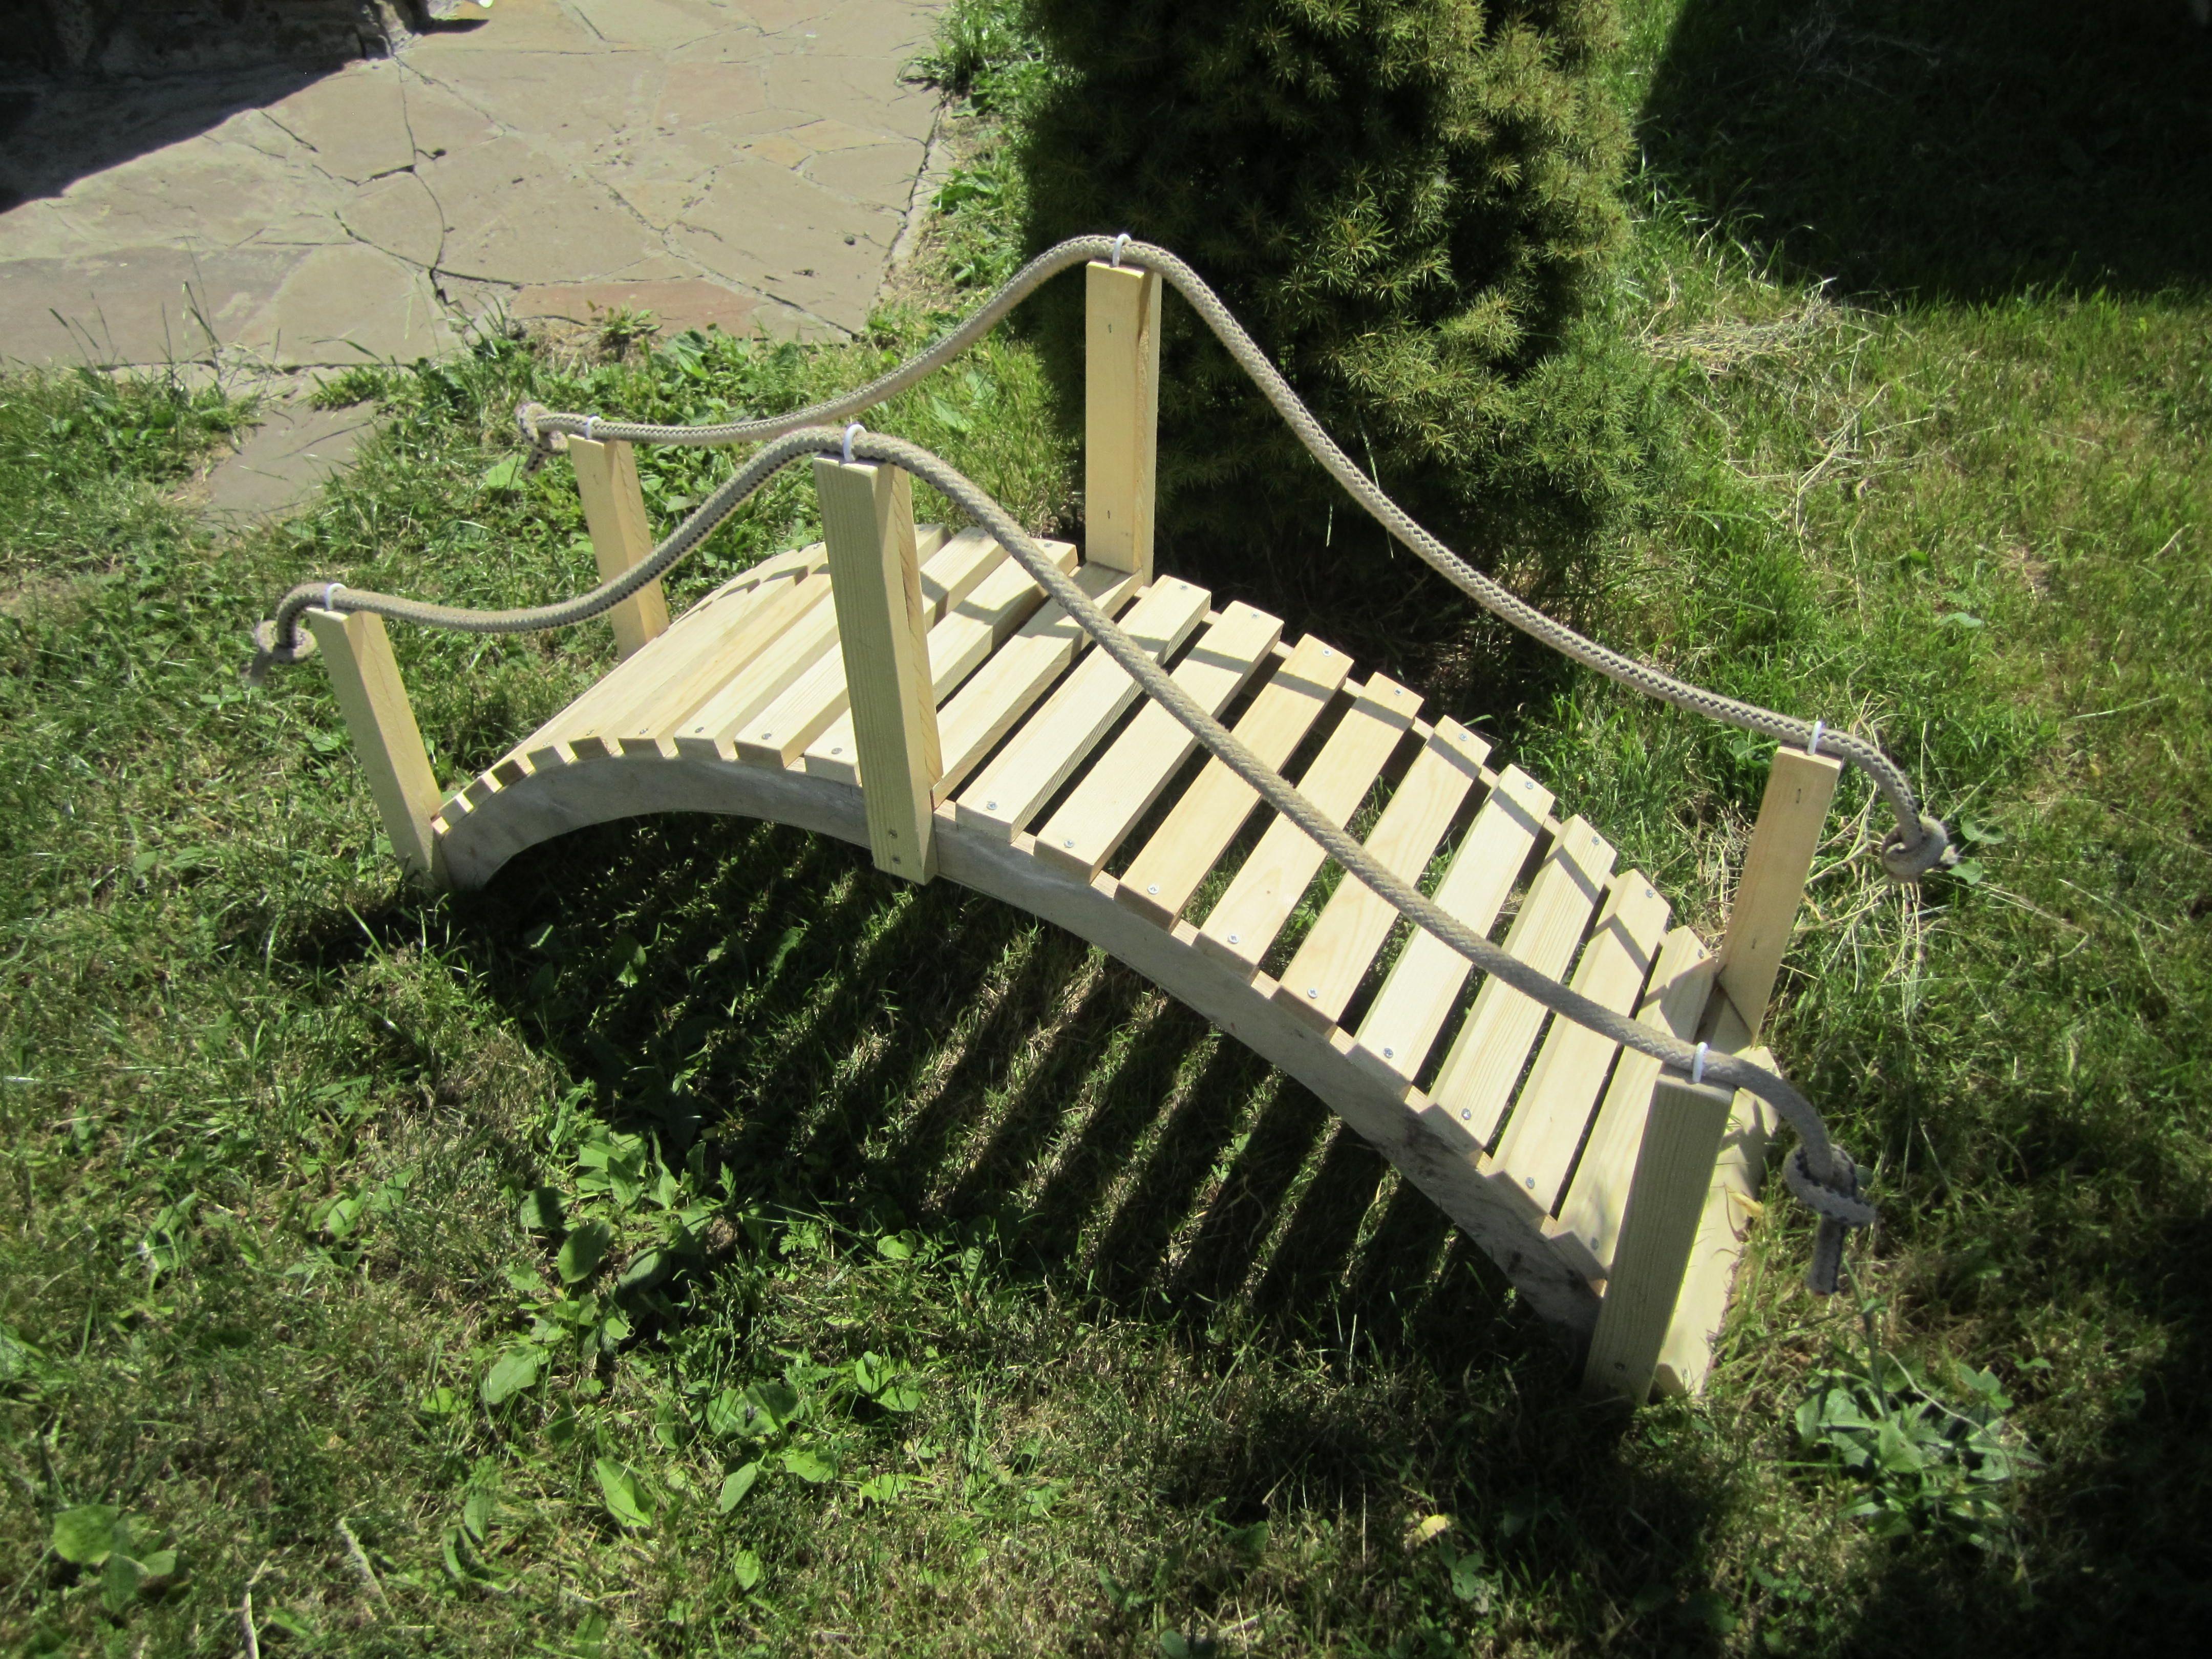 Dekorative Brücke Bauanleitung zum selber bauen | Best of 1-2-do ...